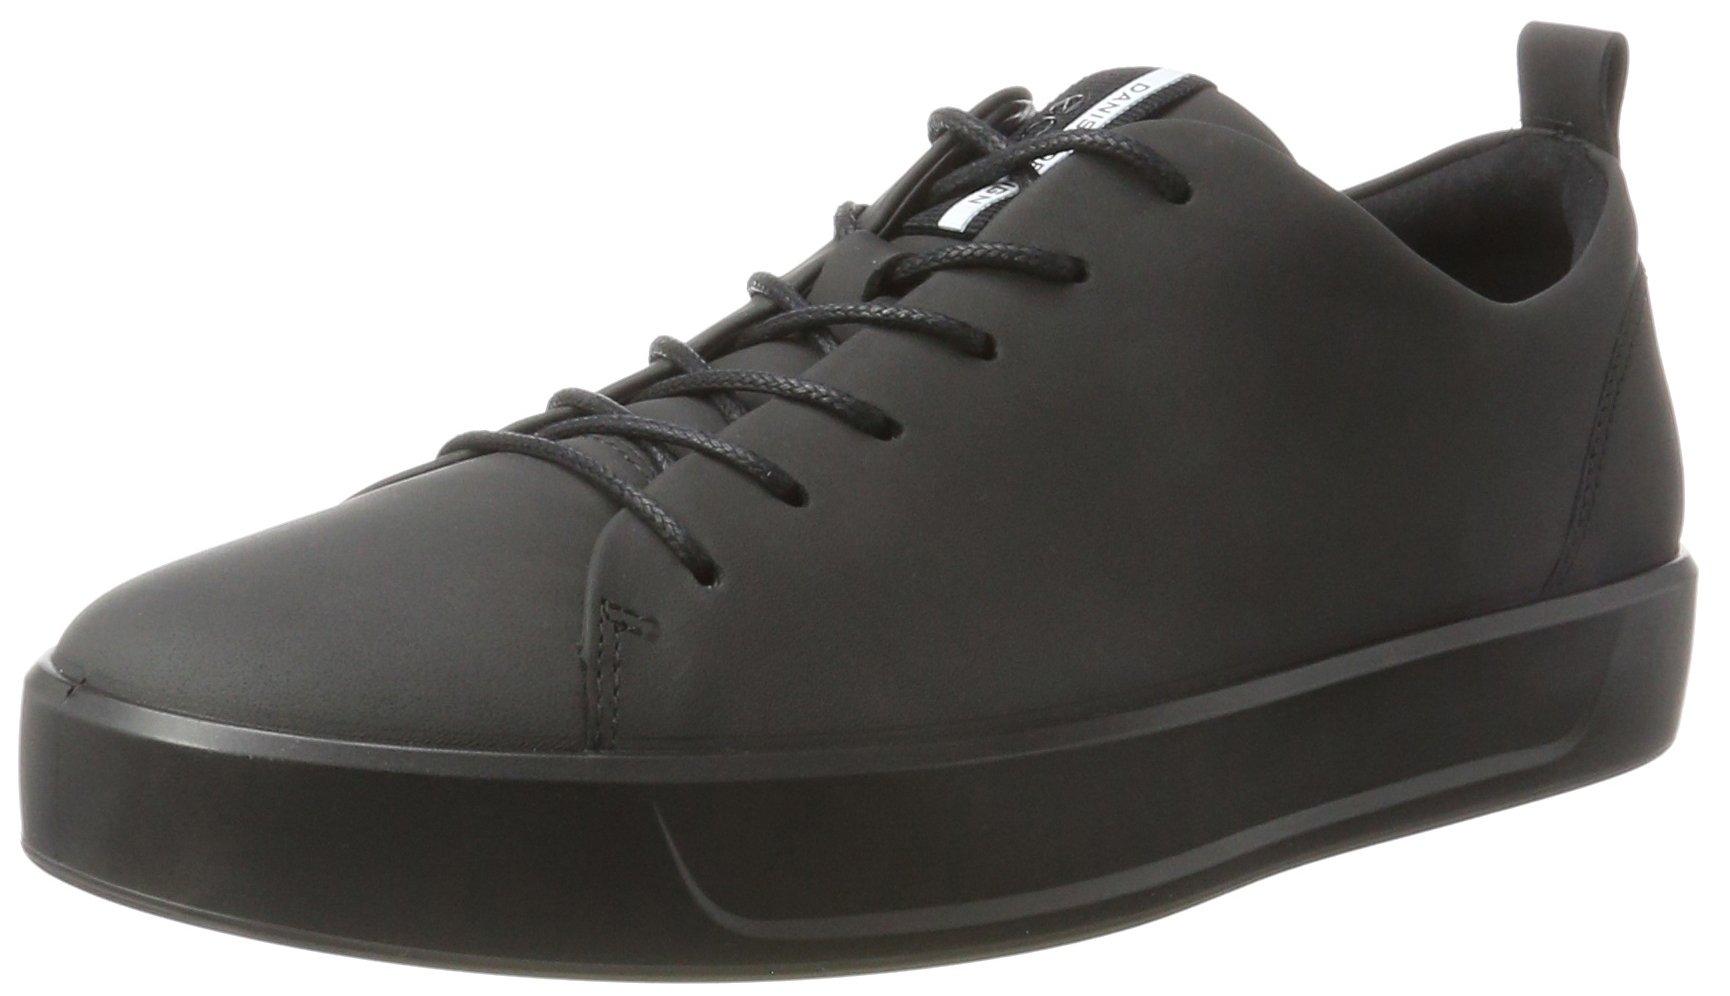 ECCO Men's Soft 8 Tie Fashion Sneaker, Black, 44 M EU / 10-10.5 D(M) US by ECCO